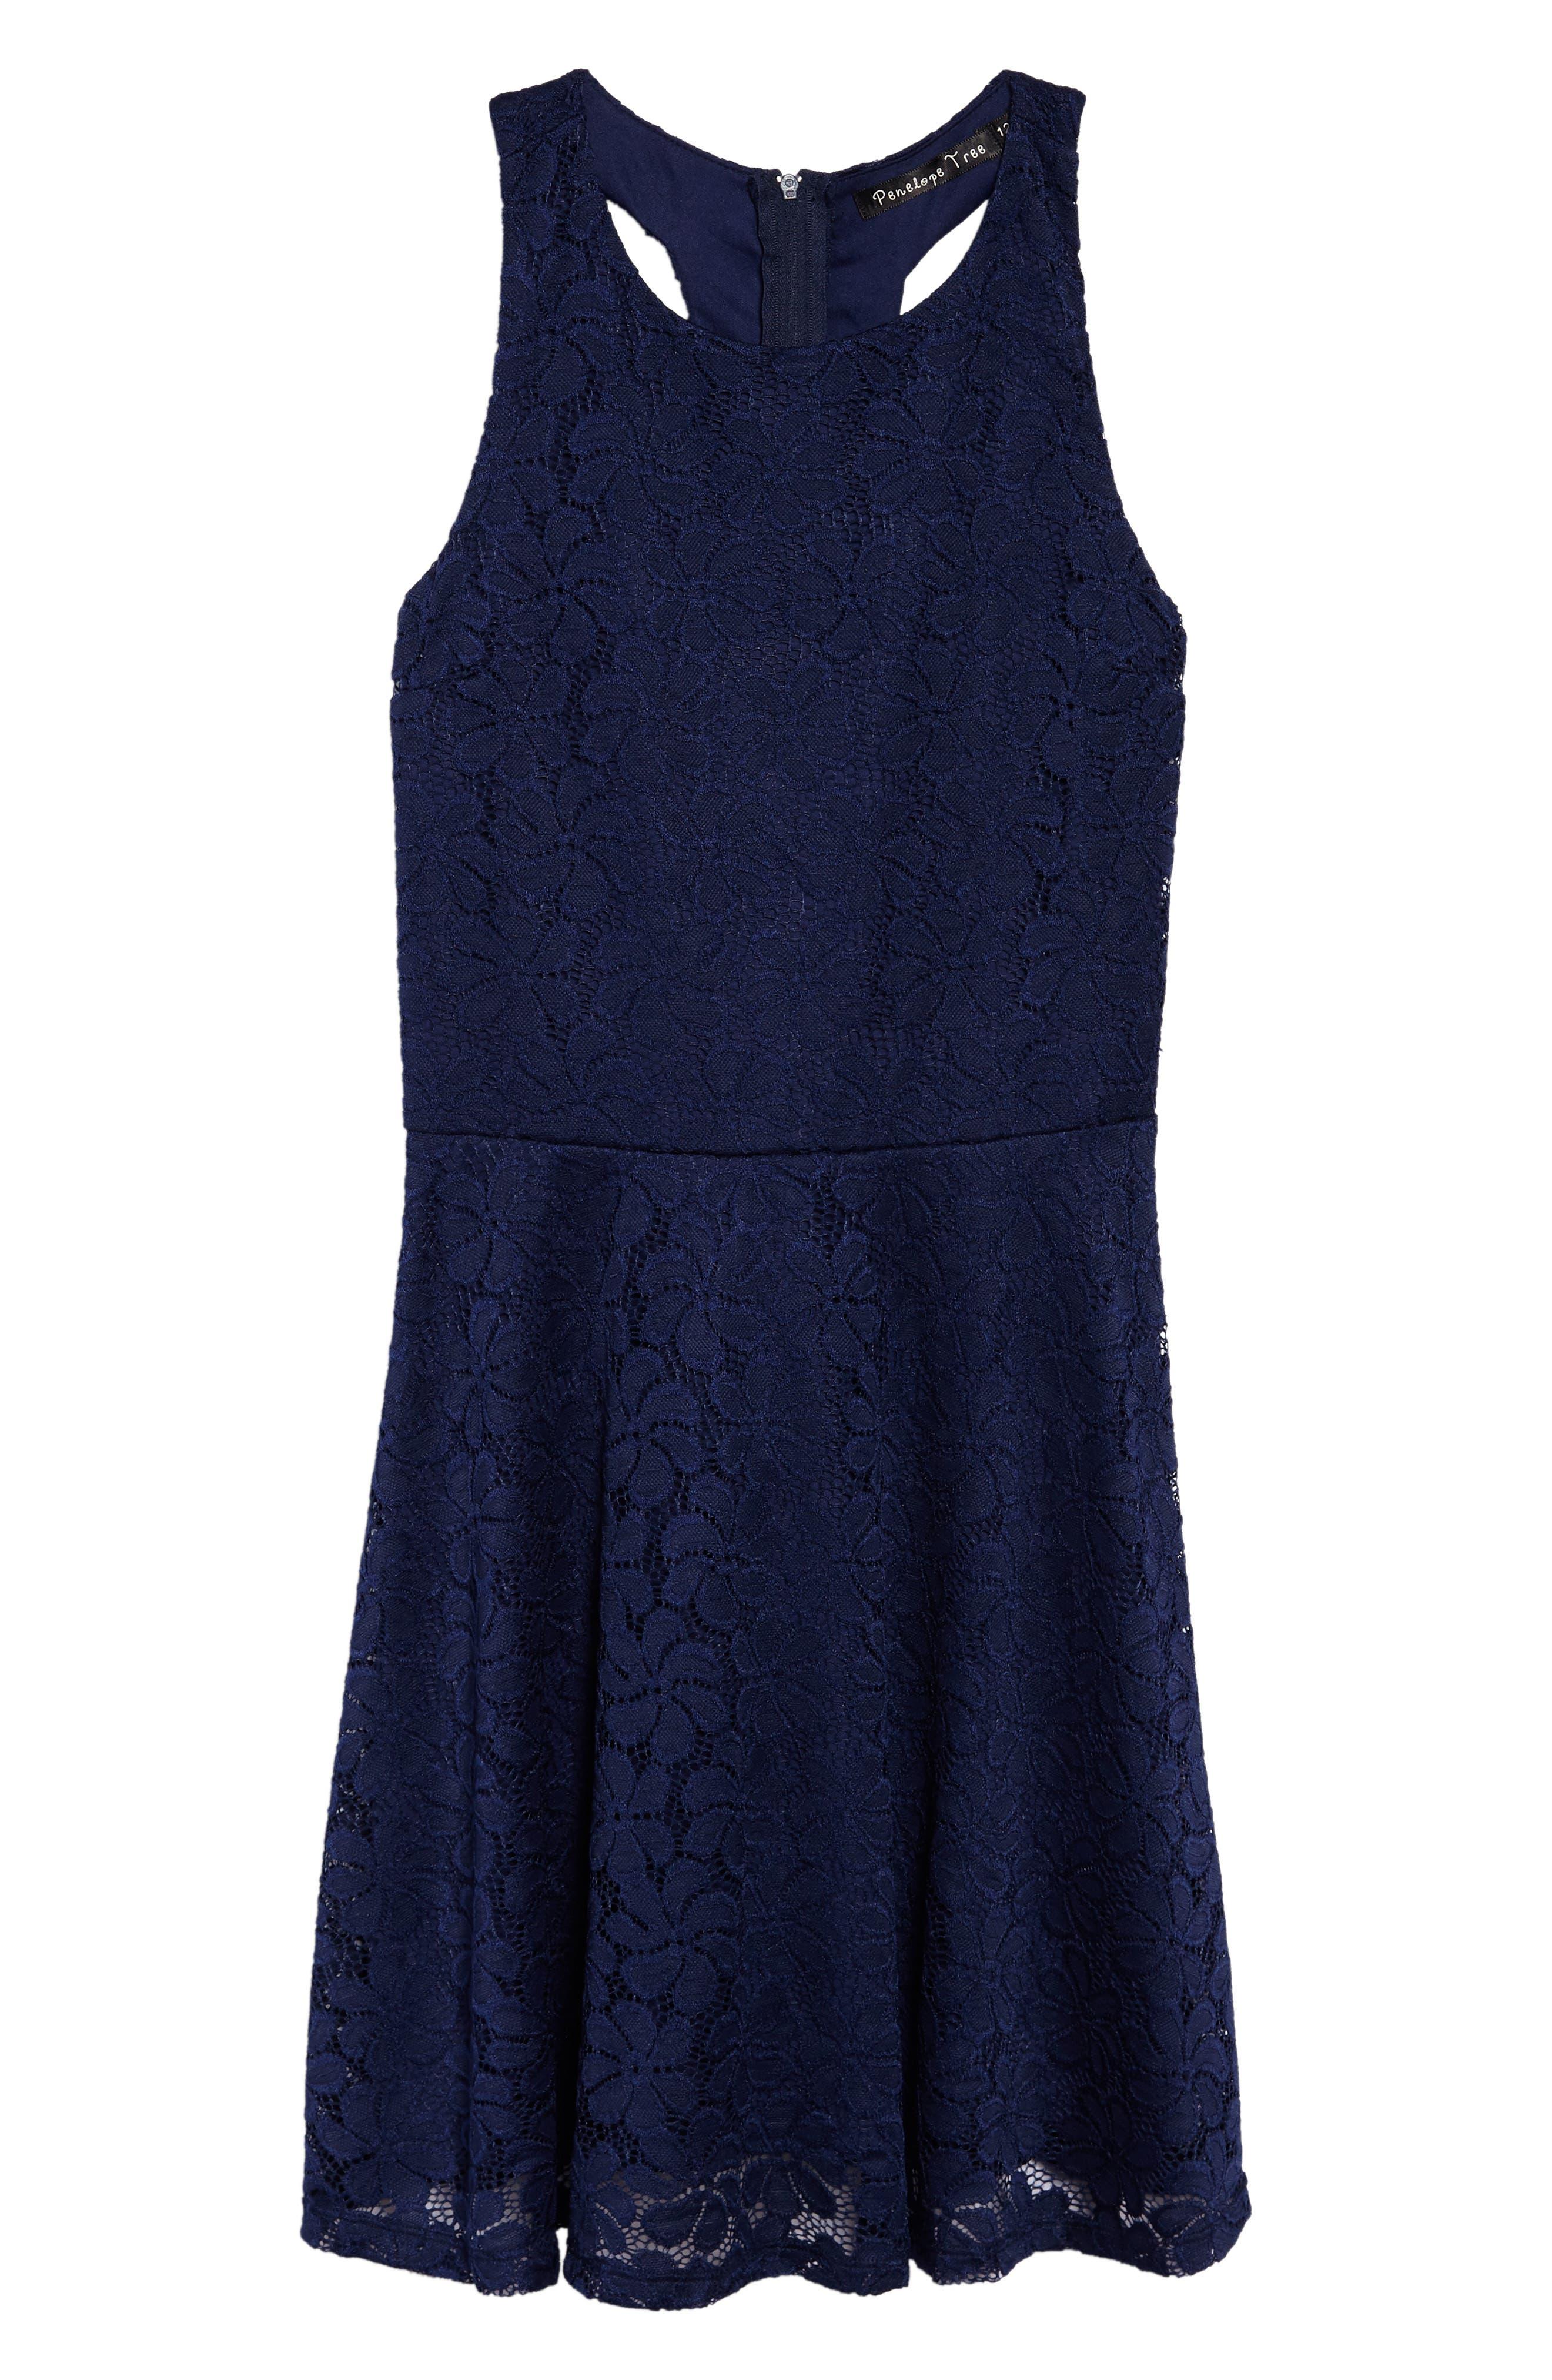 Betty Racerback Lace Dress,                             Main thumbnail 1, color,                             Navy